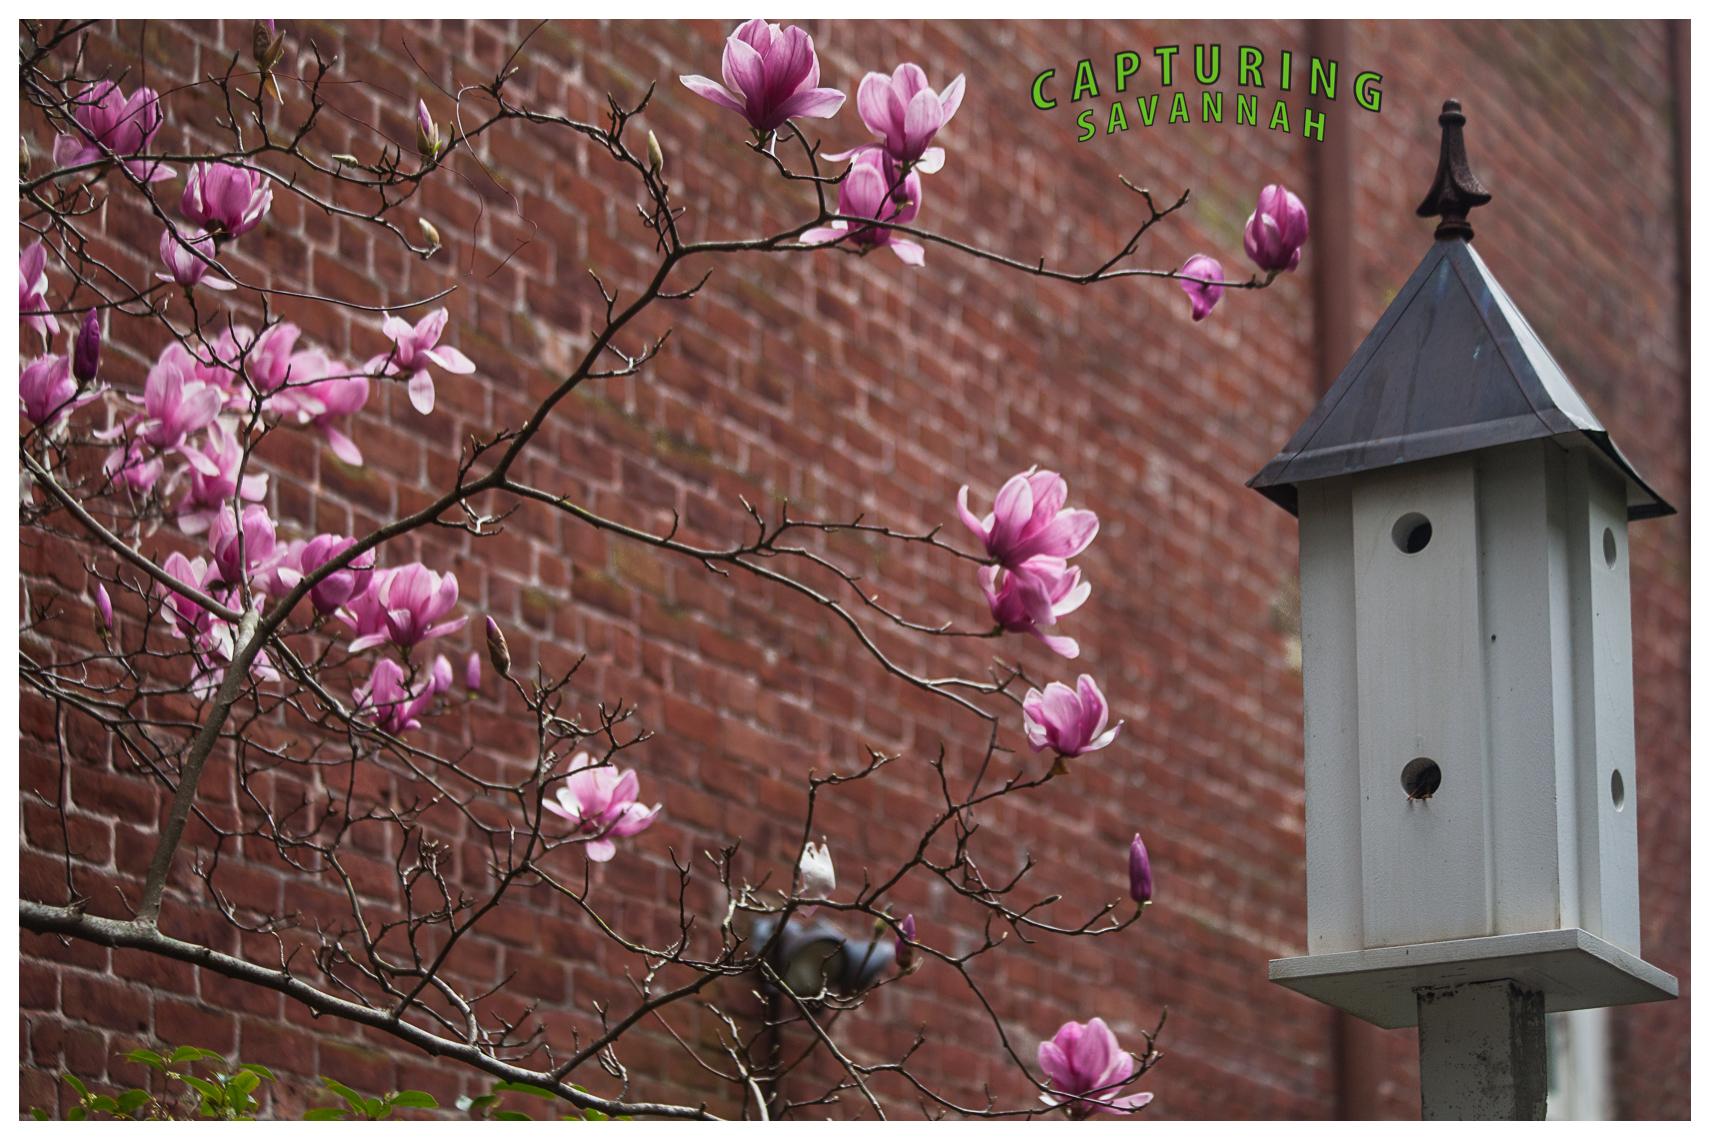 ©2014 Capturing Savannah_Spring-flwrs.3.jpg